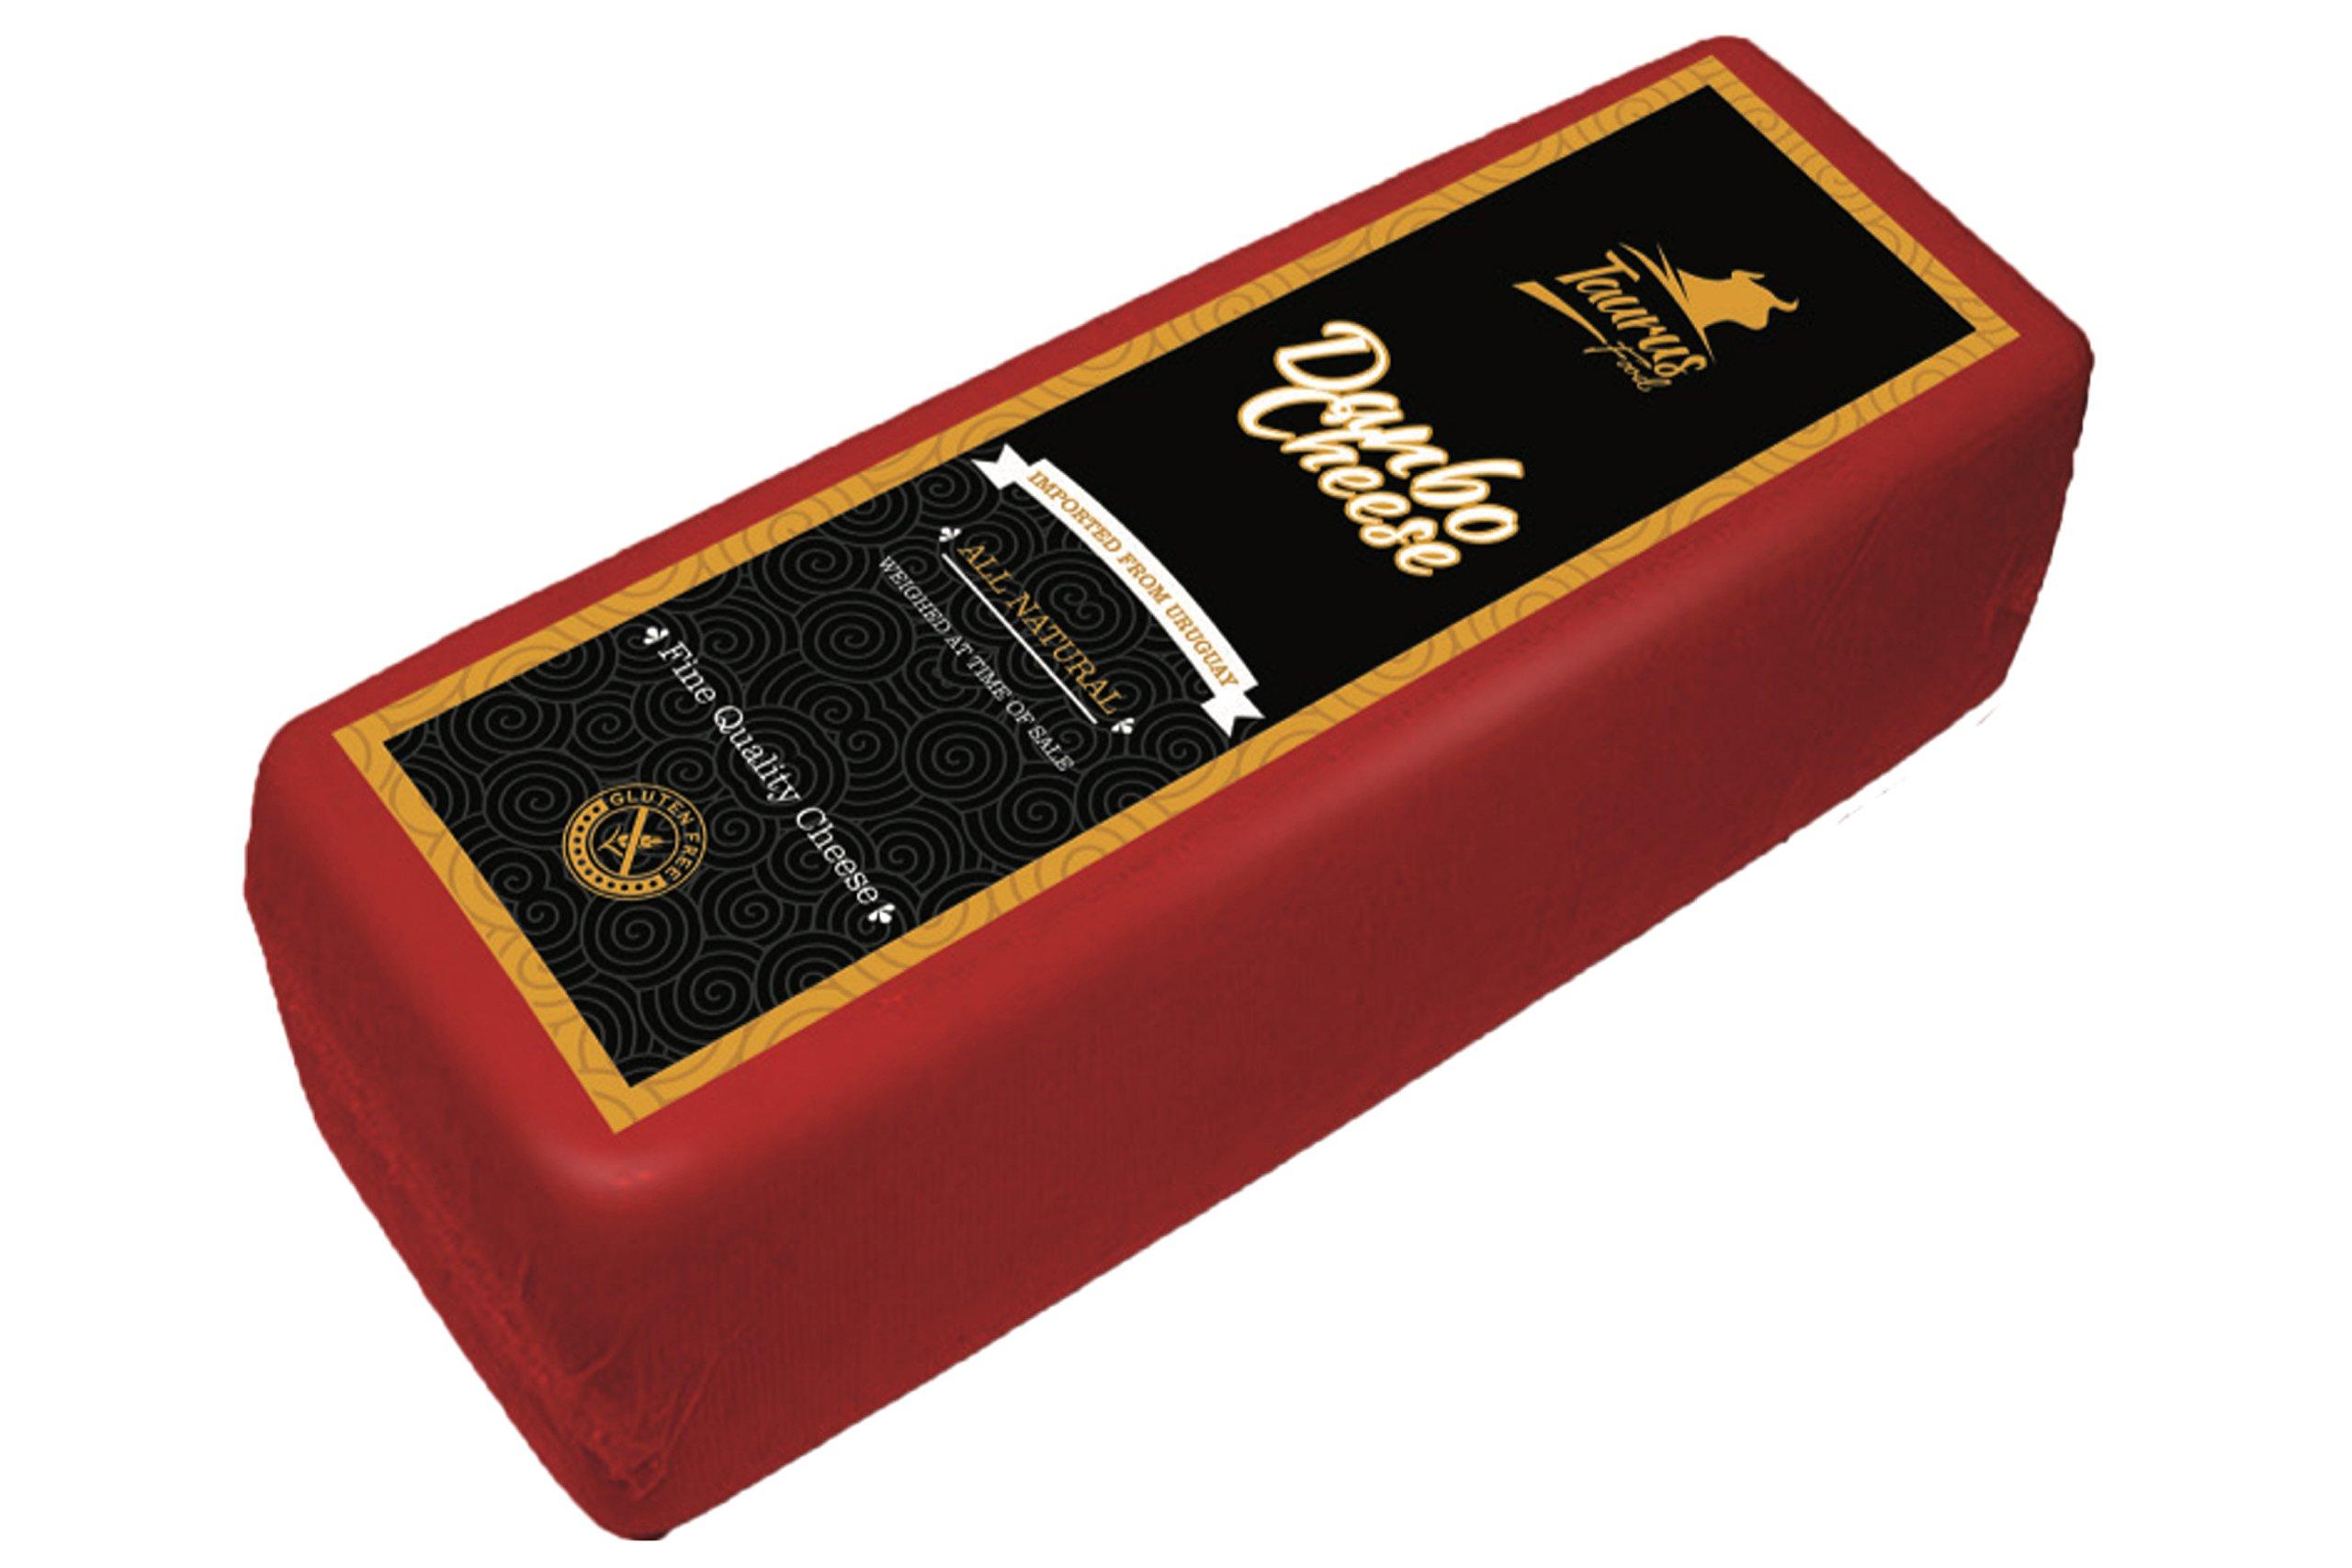 Danbo Gouda Style Uruguayan Matured - Semi-soft - Aged Danish Cheese (6.6 Pounds Approximately) Gluten & Hormone free